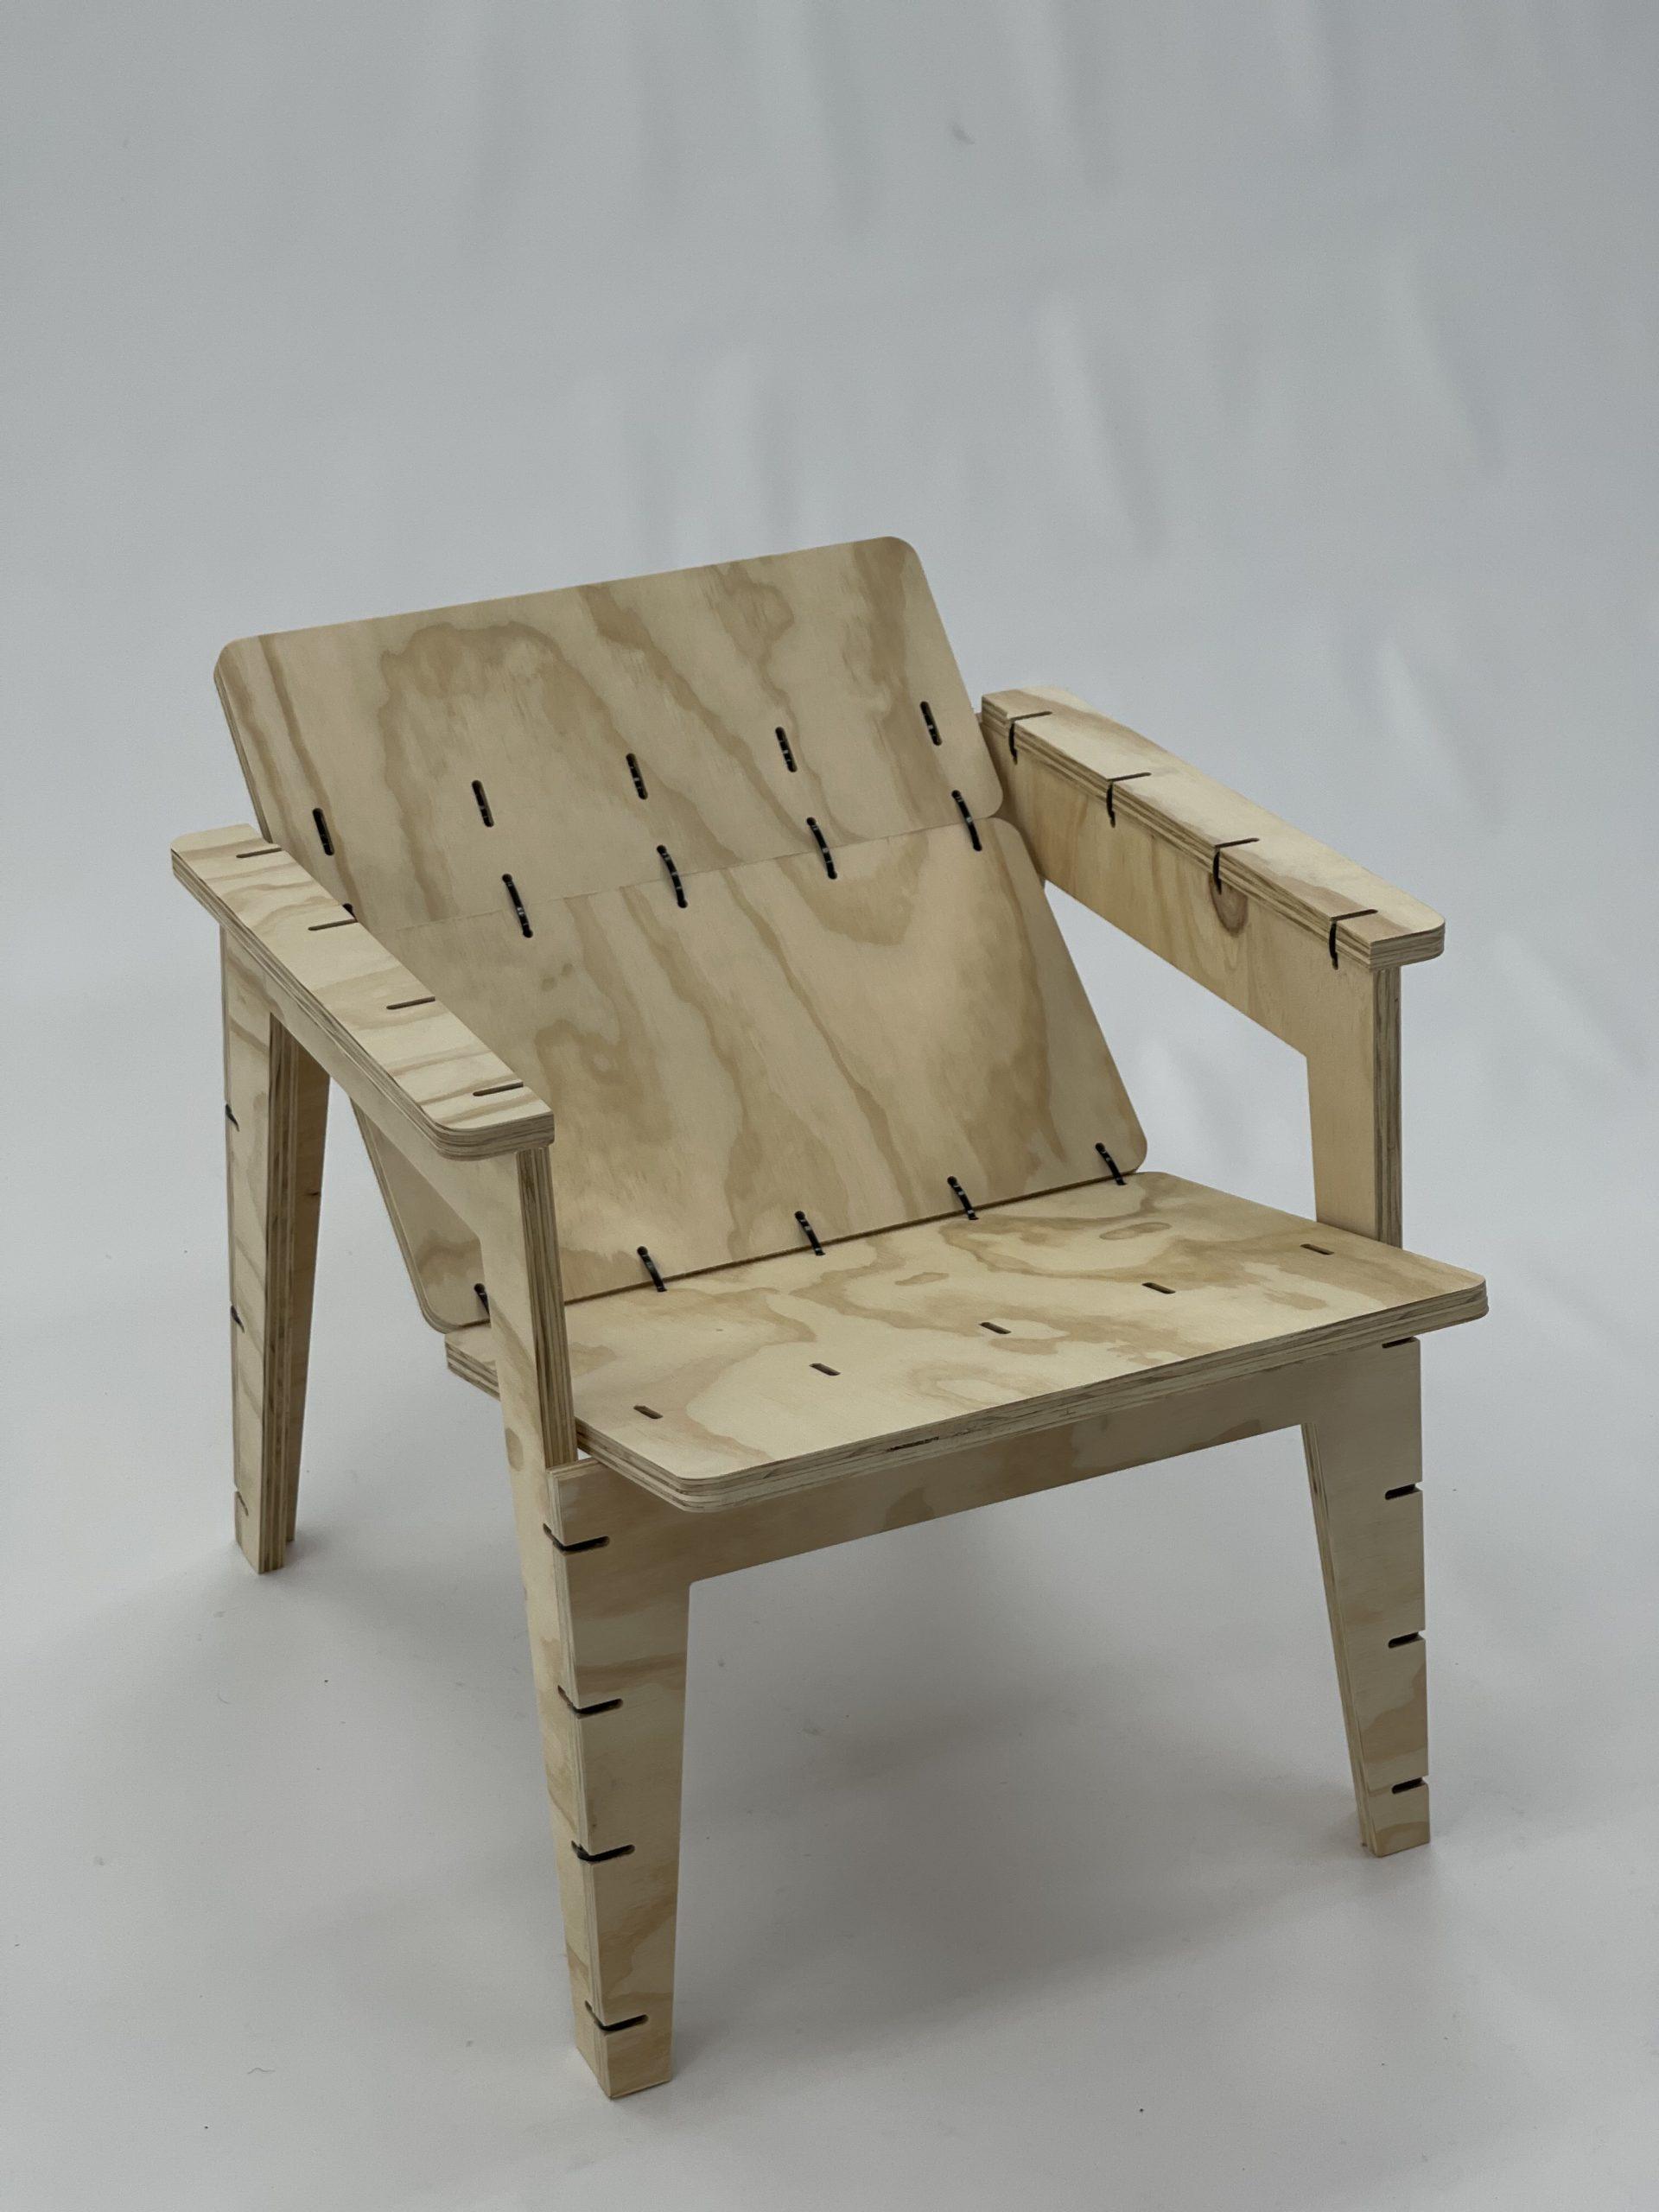 #67 Benga Zippy Lounge Chair